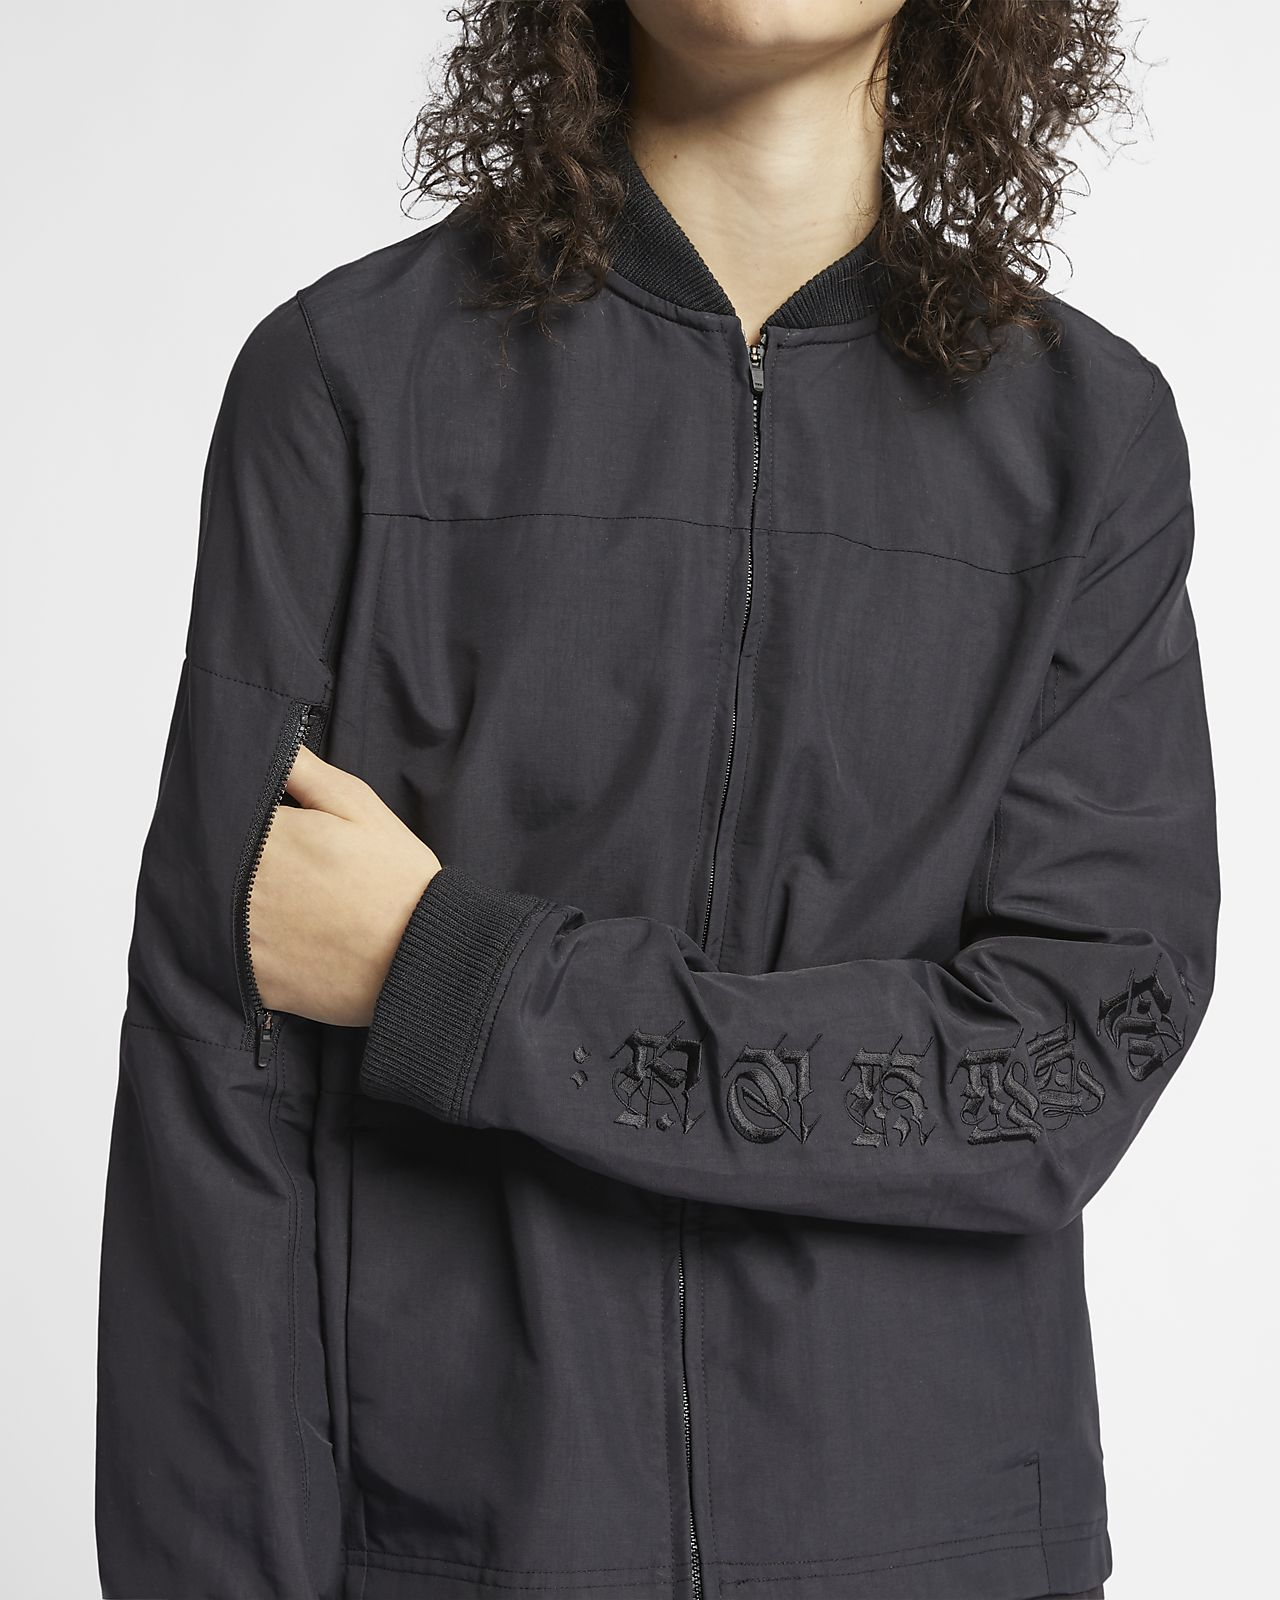 c3154587e Hurley Cryptik Women's Bomber Jacket